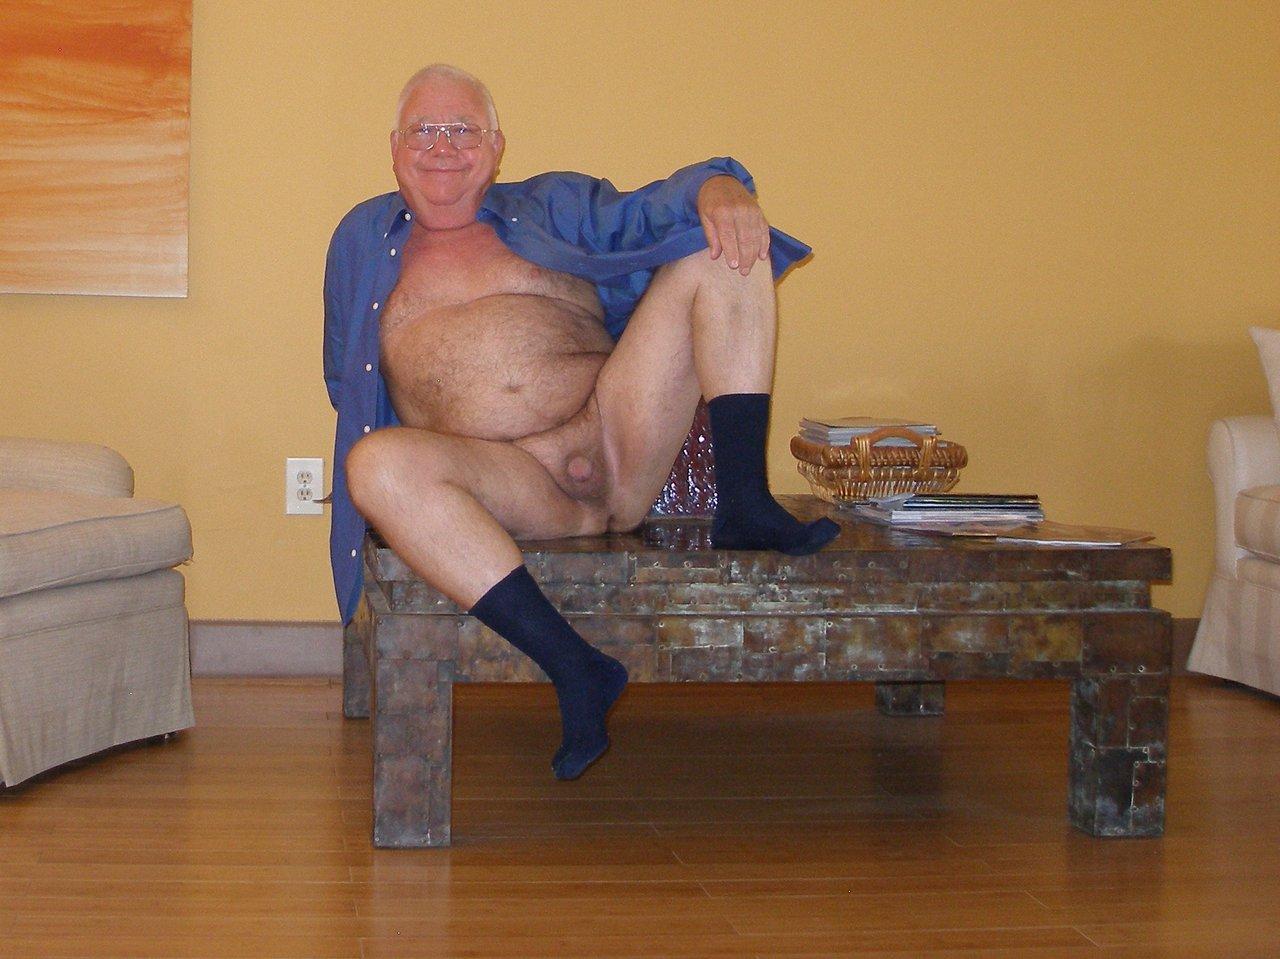 Pics Of Naked Older Men B G Gay Me